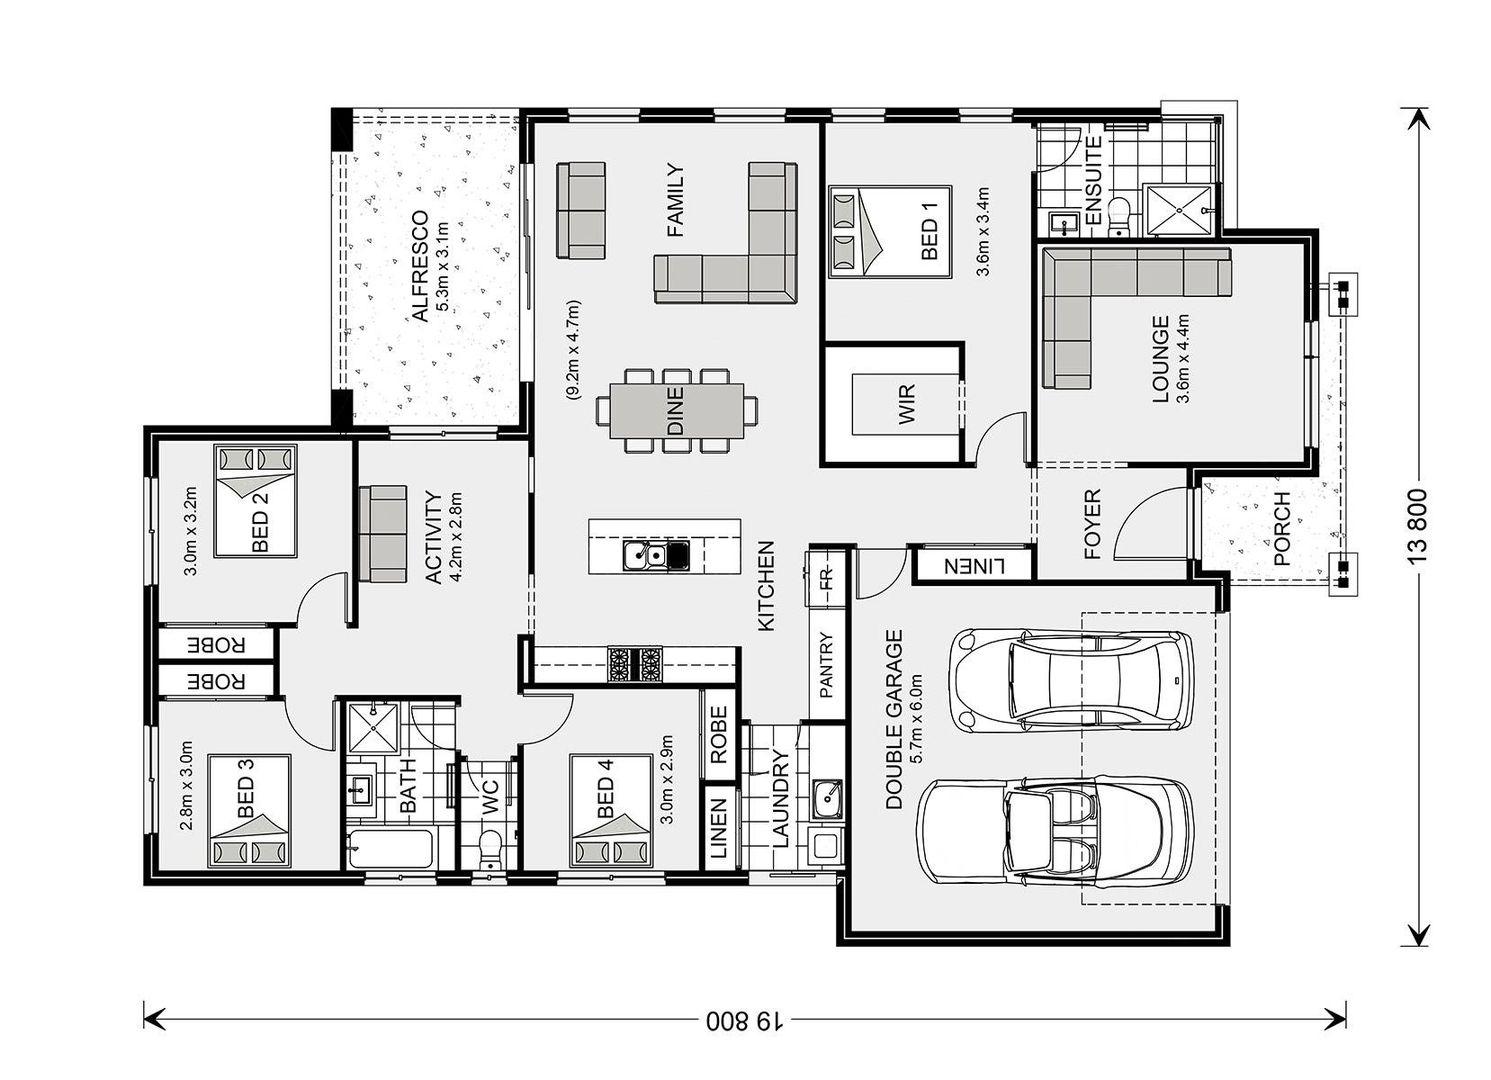 Lot 52 Avon Views Estate, Stratford VIC 3862, Image 1